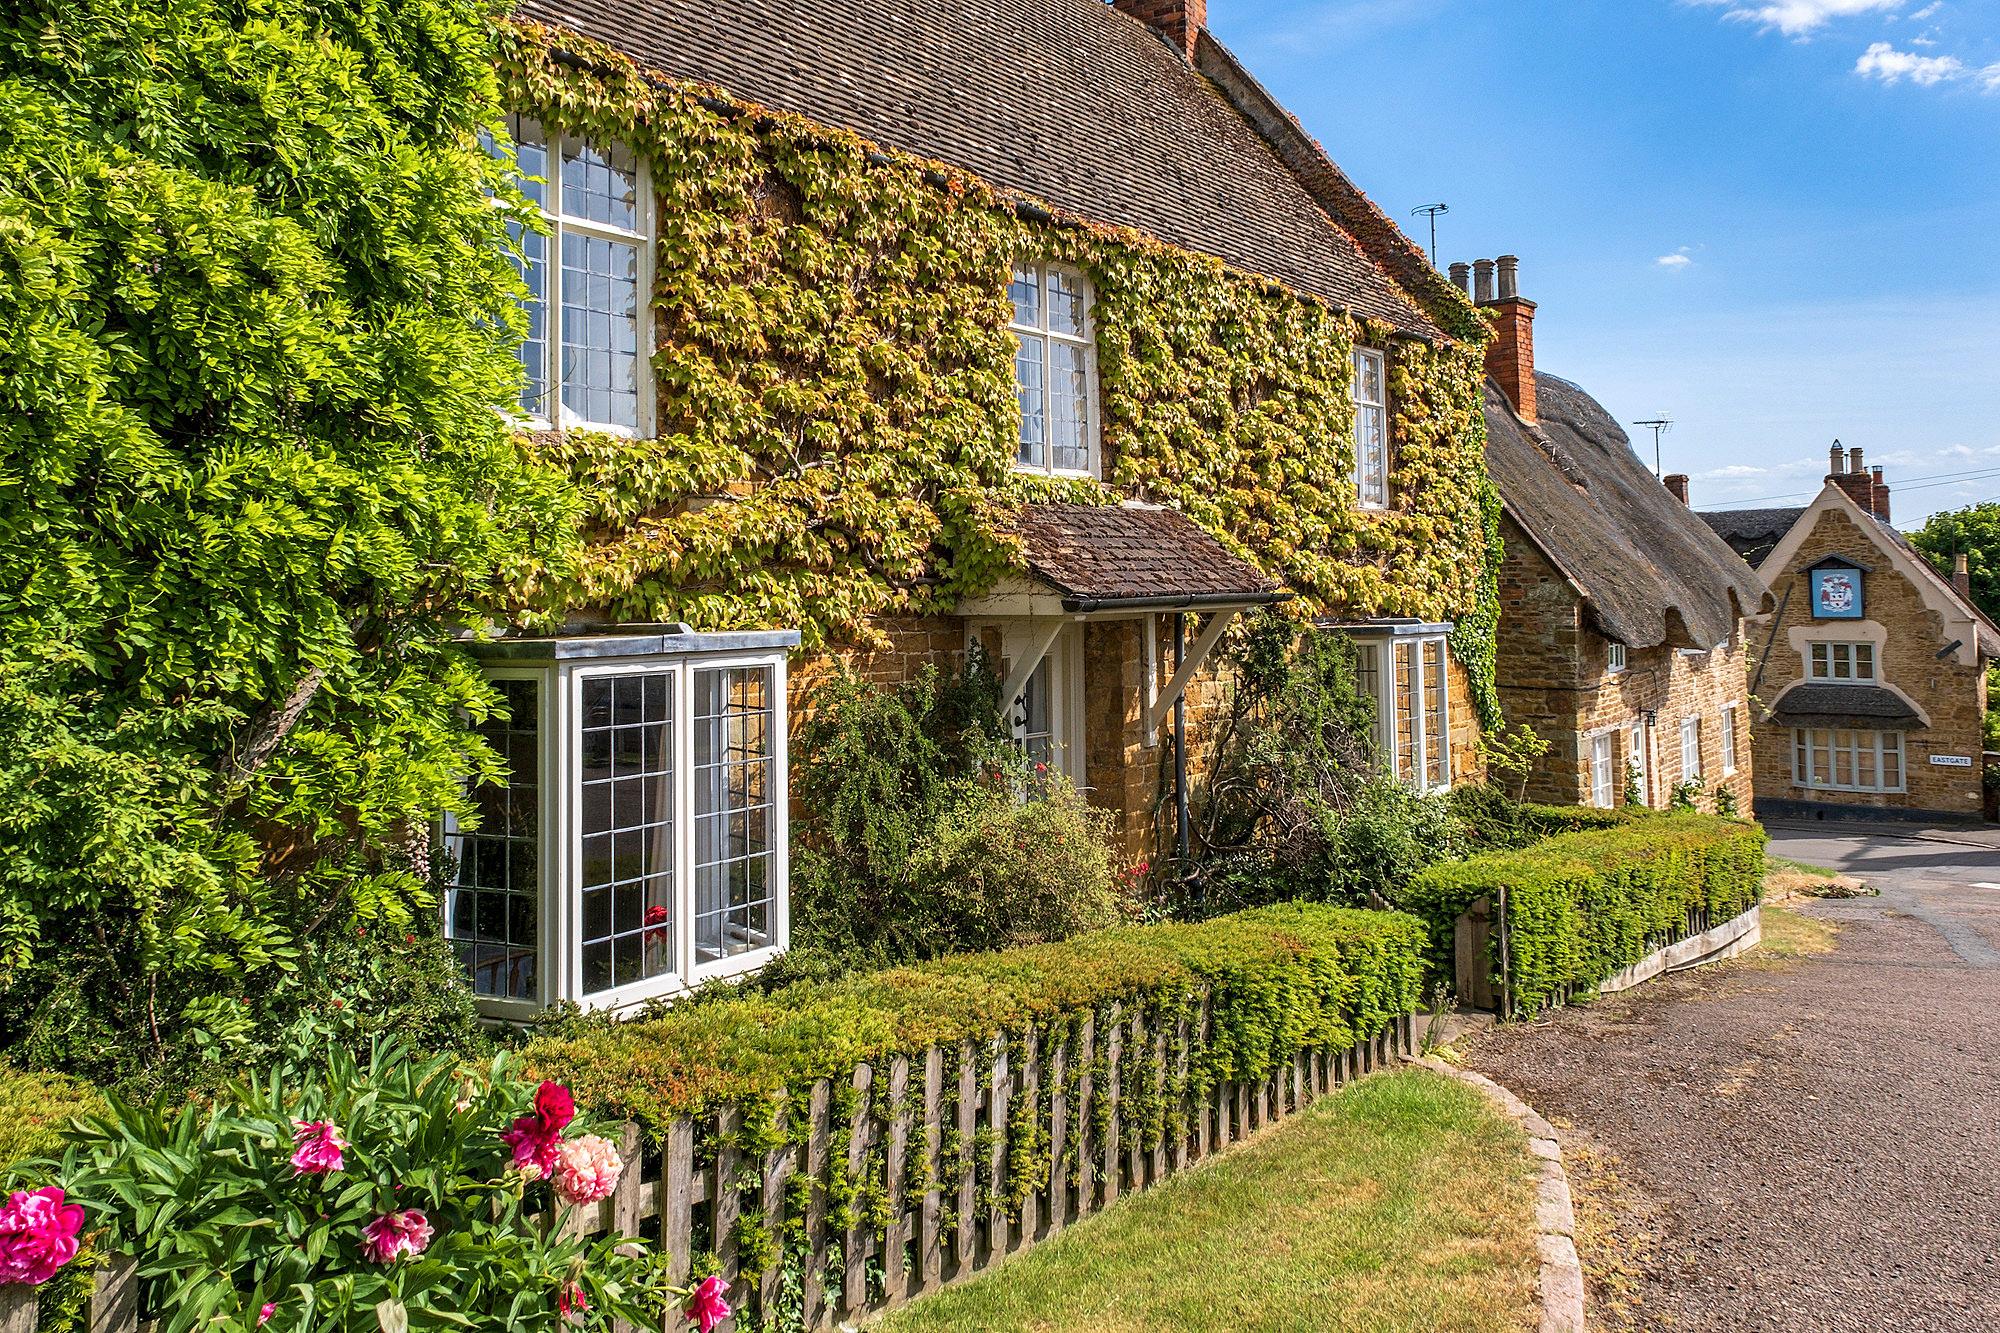 Hallaton, Leicestershire by Jim Monk.jpg